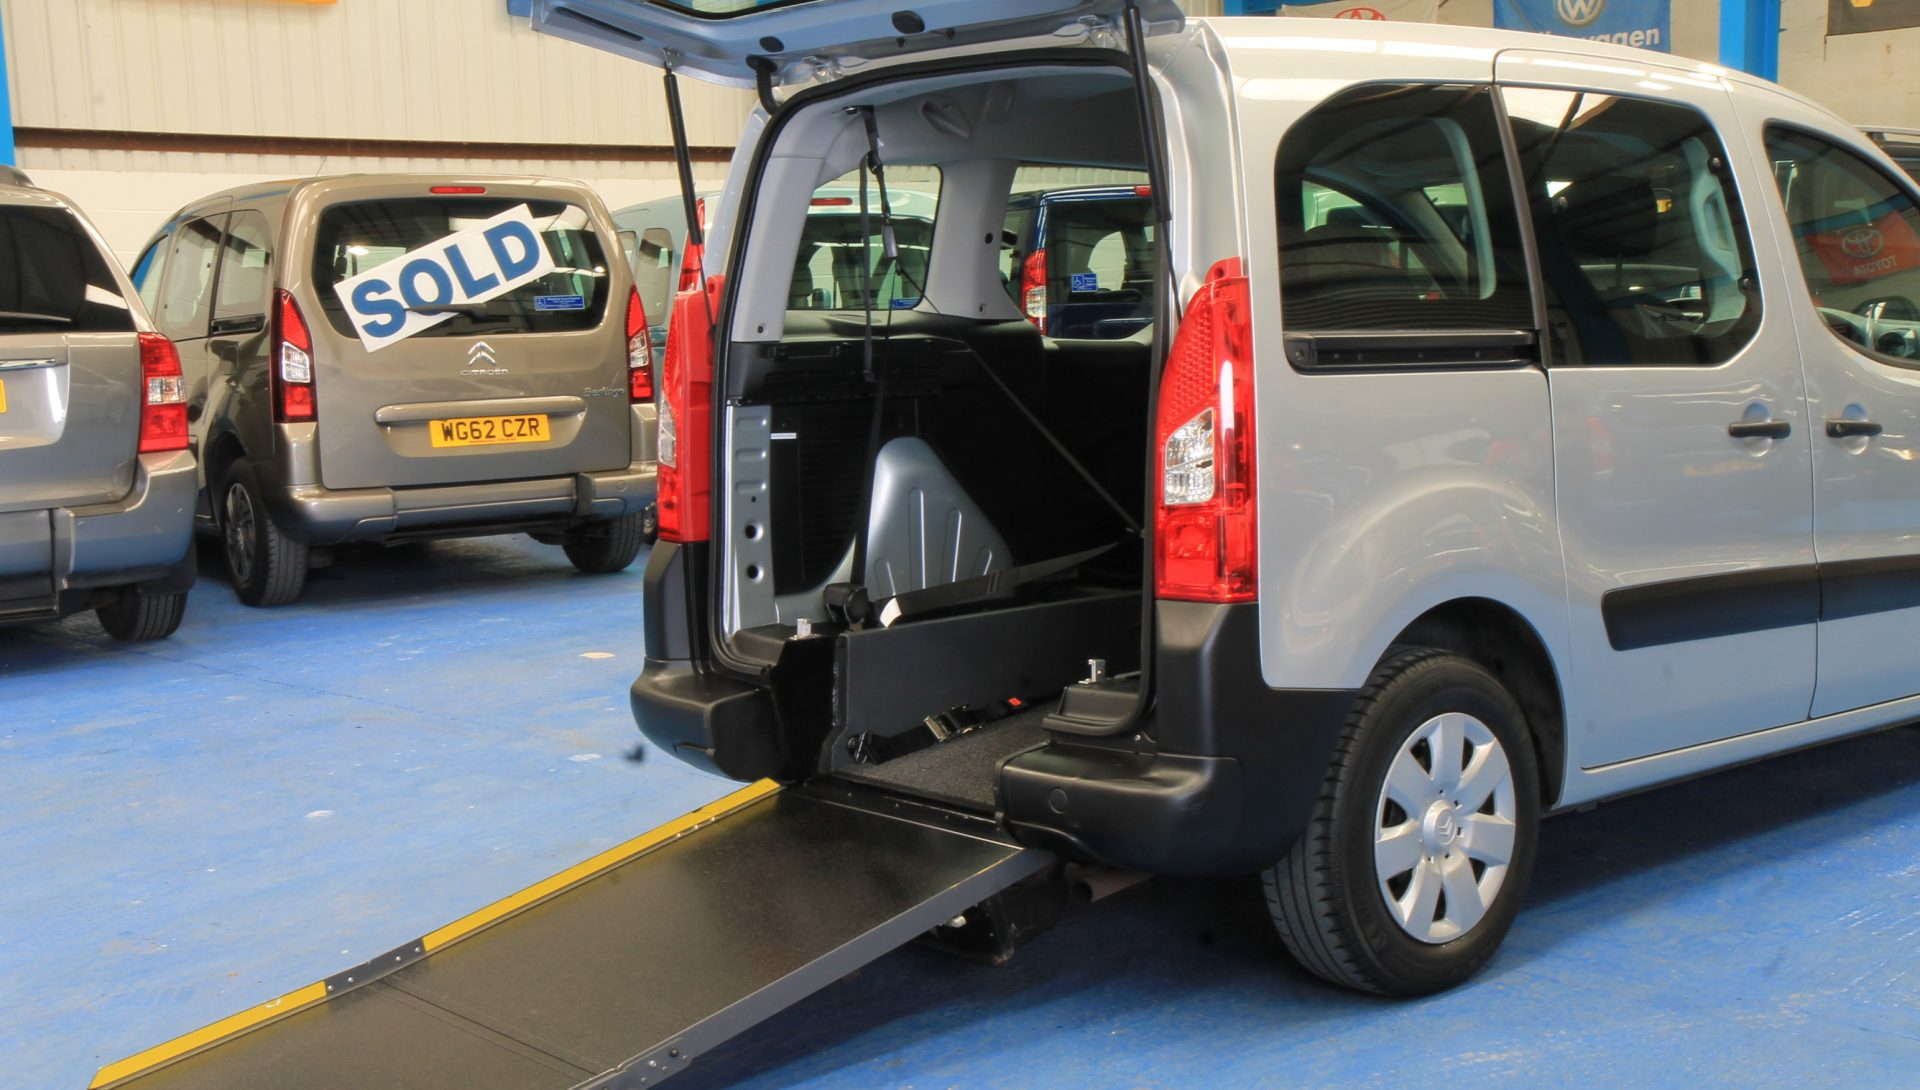 Petrol berlingo Wheelchair access car wf10